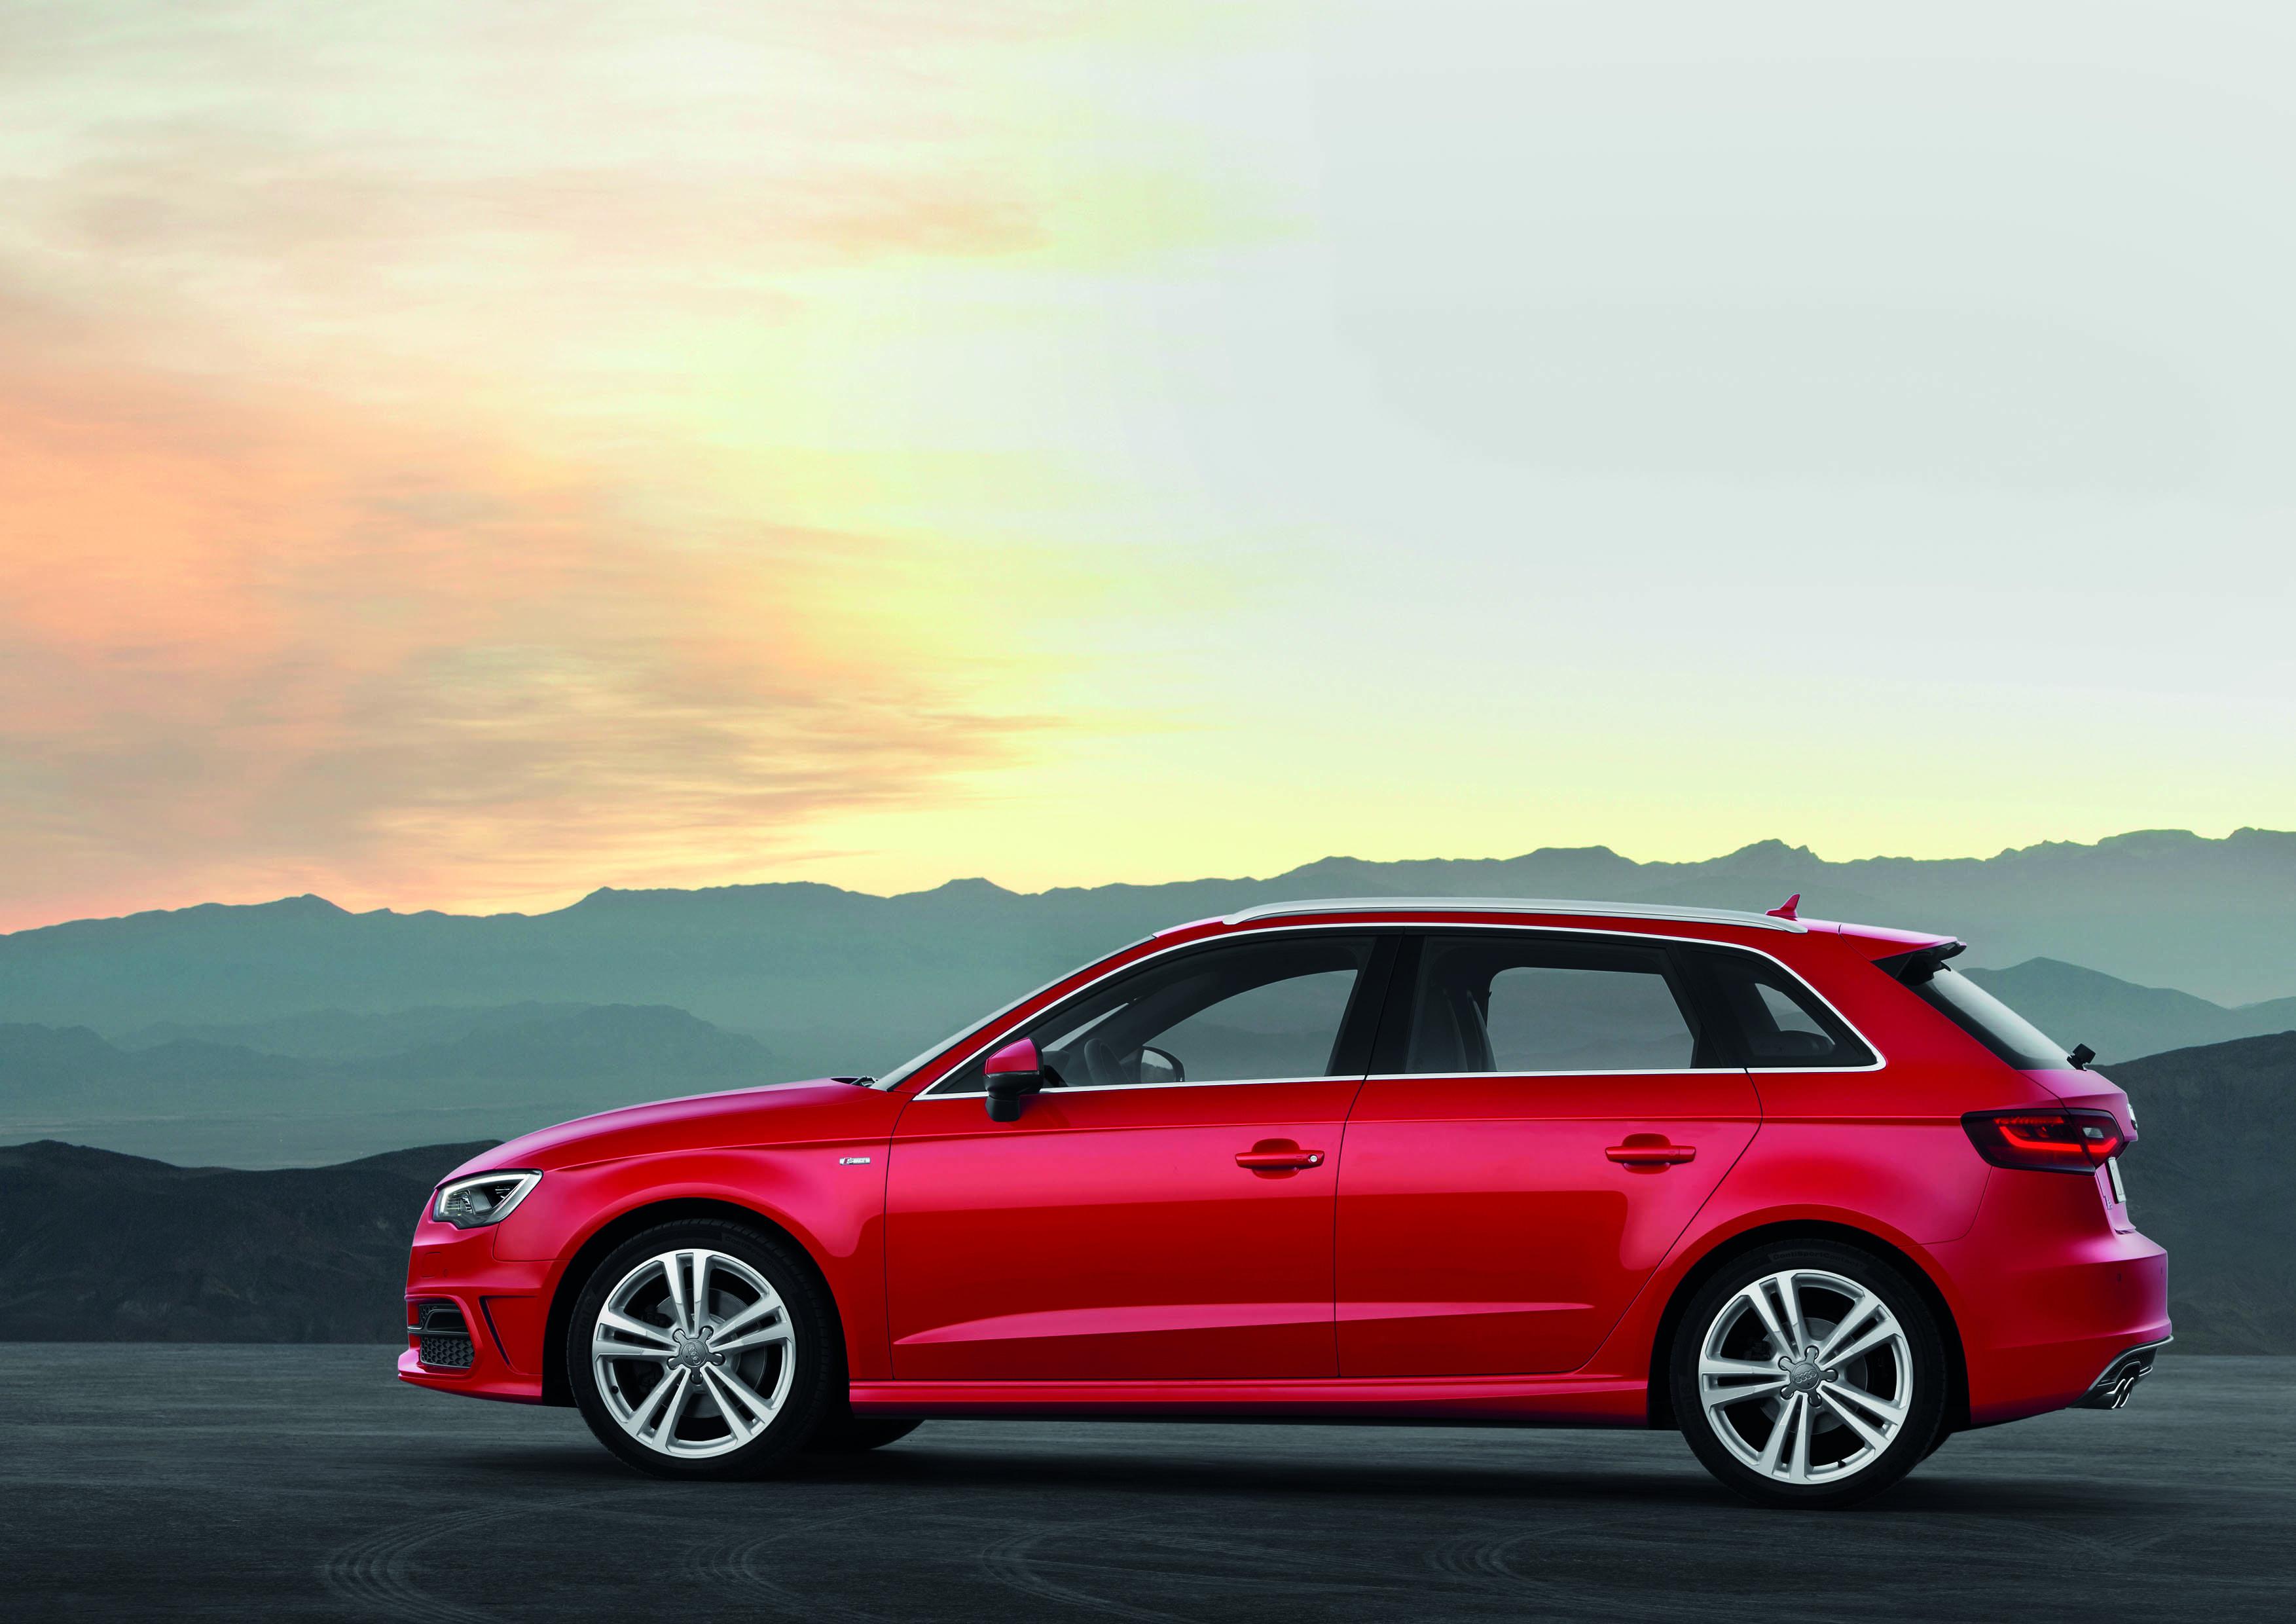 Audi A3 Sportback Full Details Of Premium Small Hatch